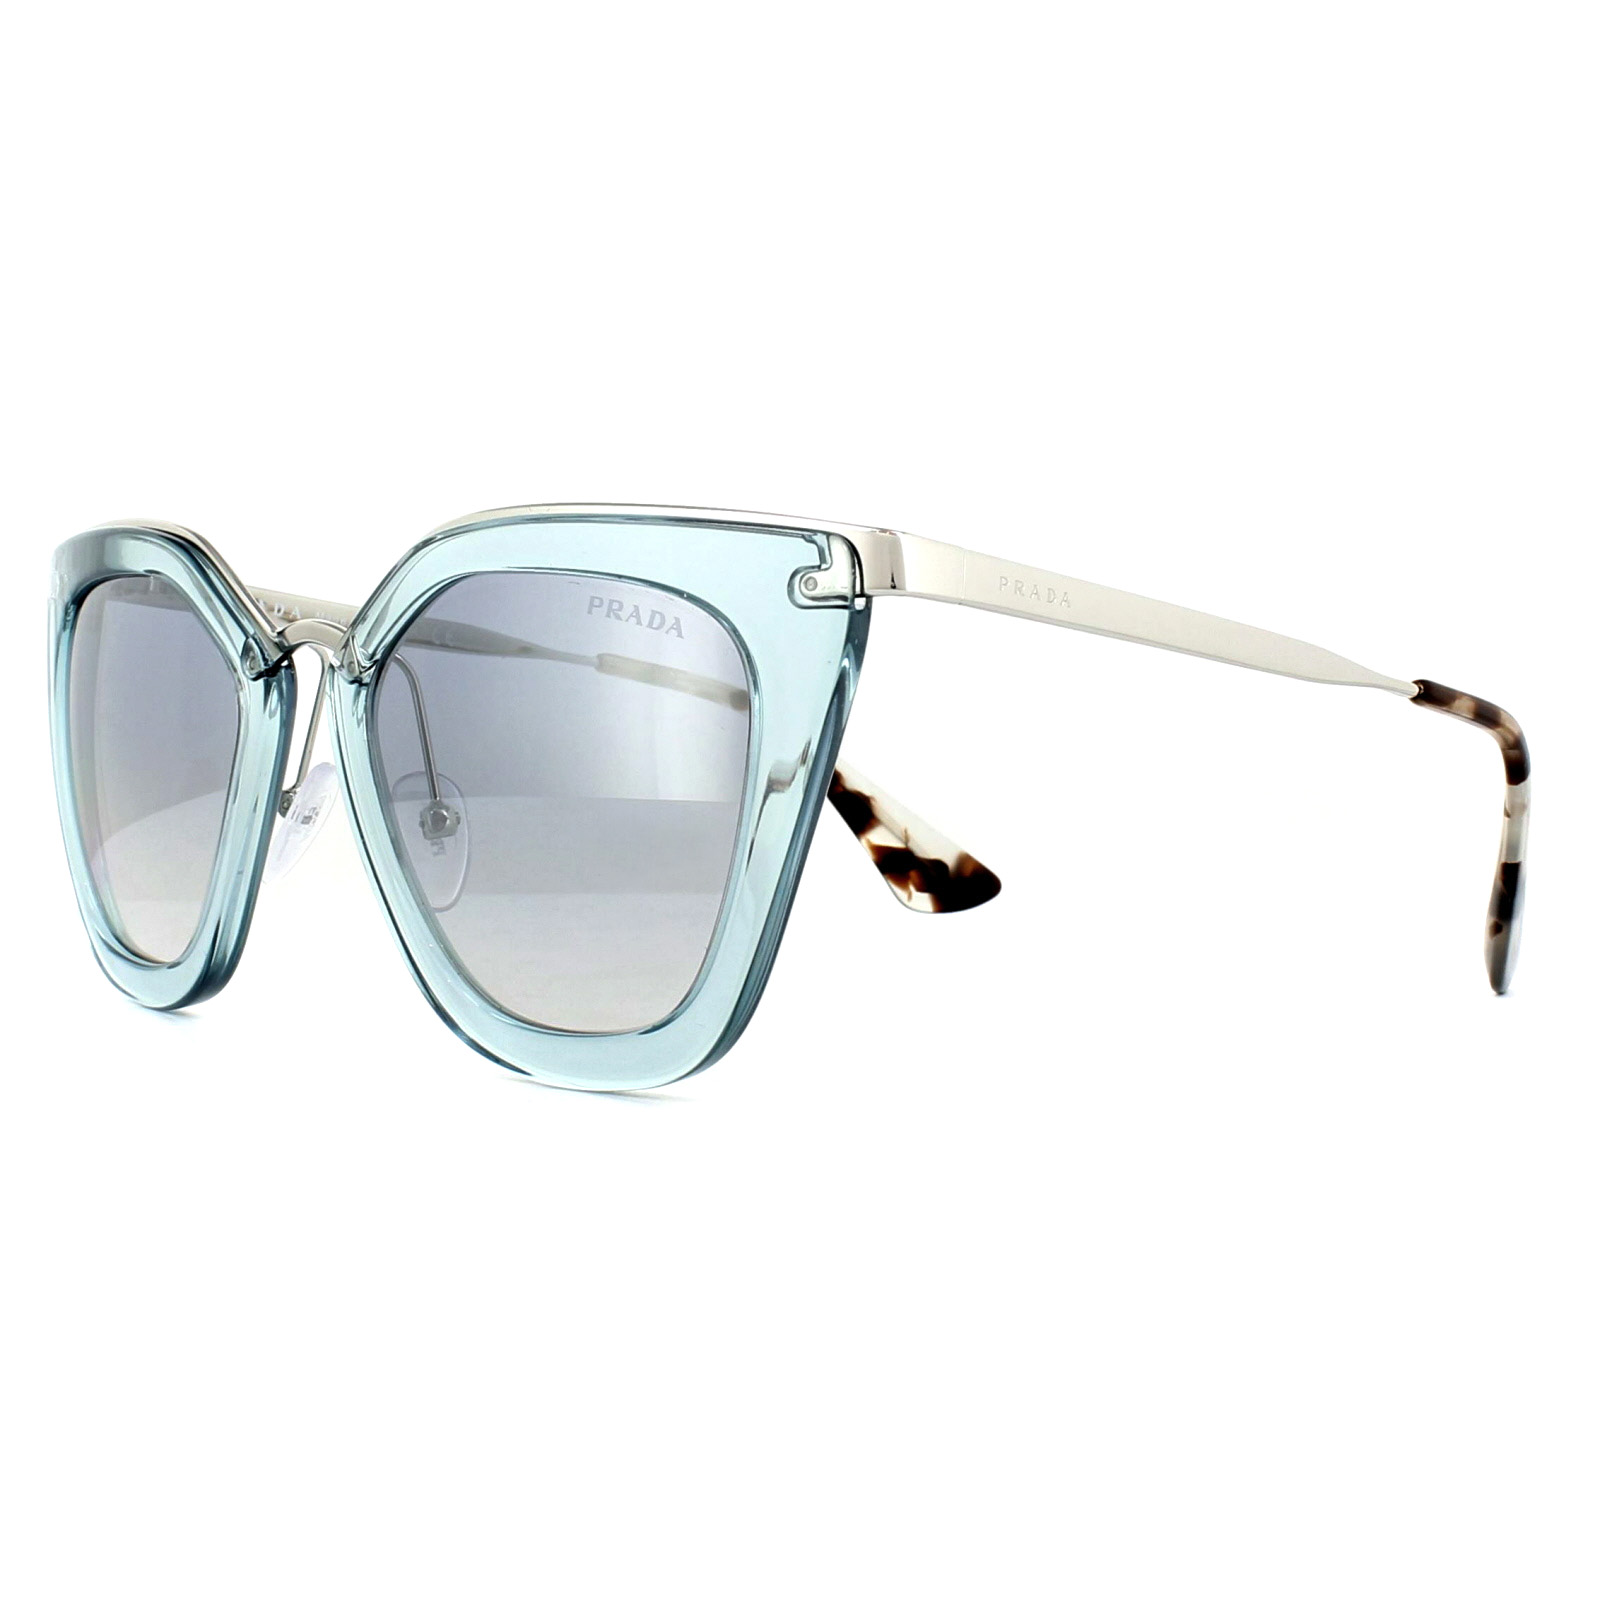 b98b07c708ccd Sentinel Prada Sunglasses Cinema Evolution 53SS VYS5R0 Transparent Azure  Blue Mirror